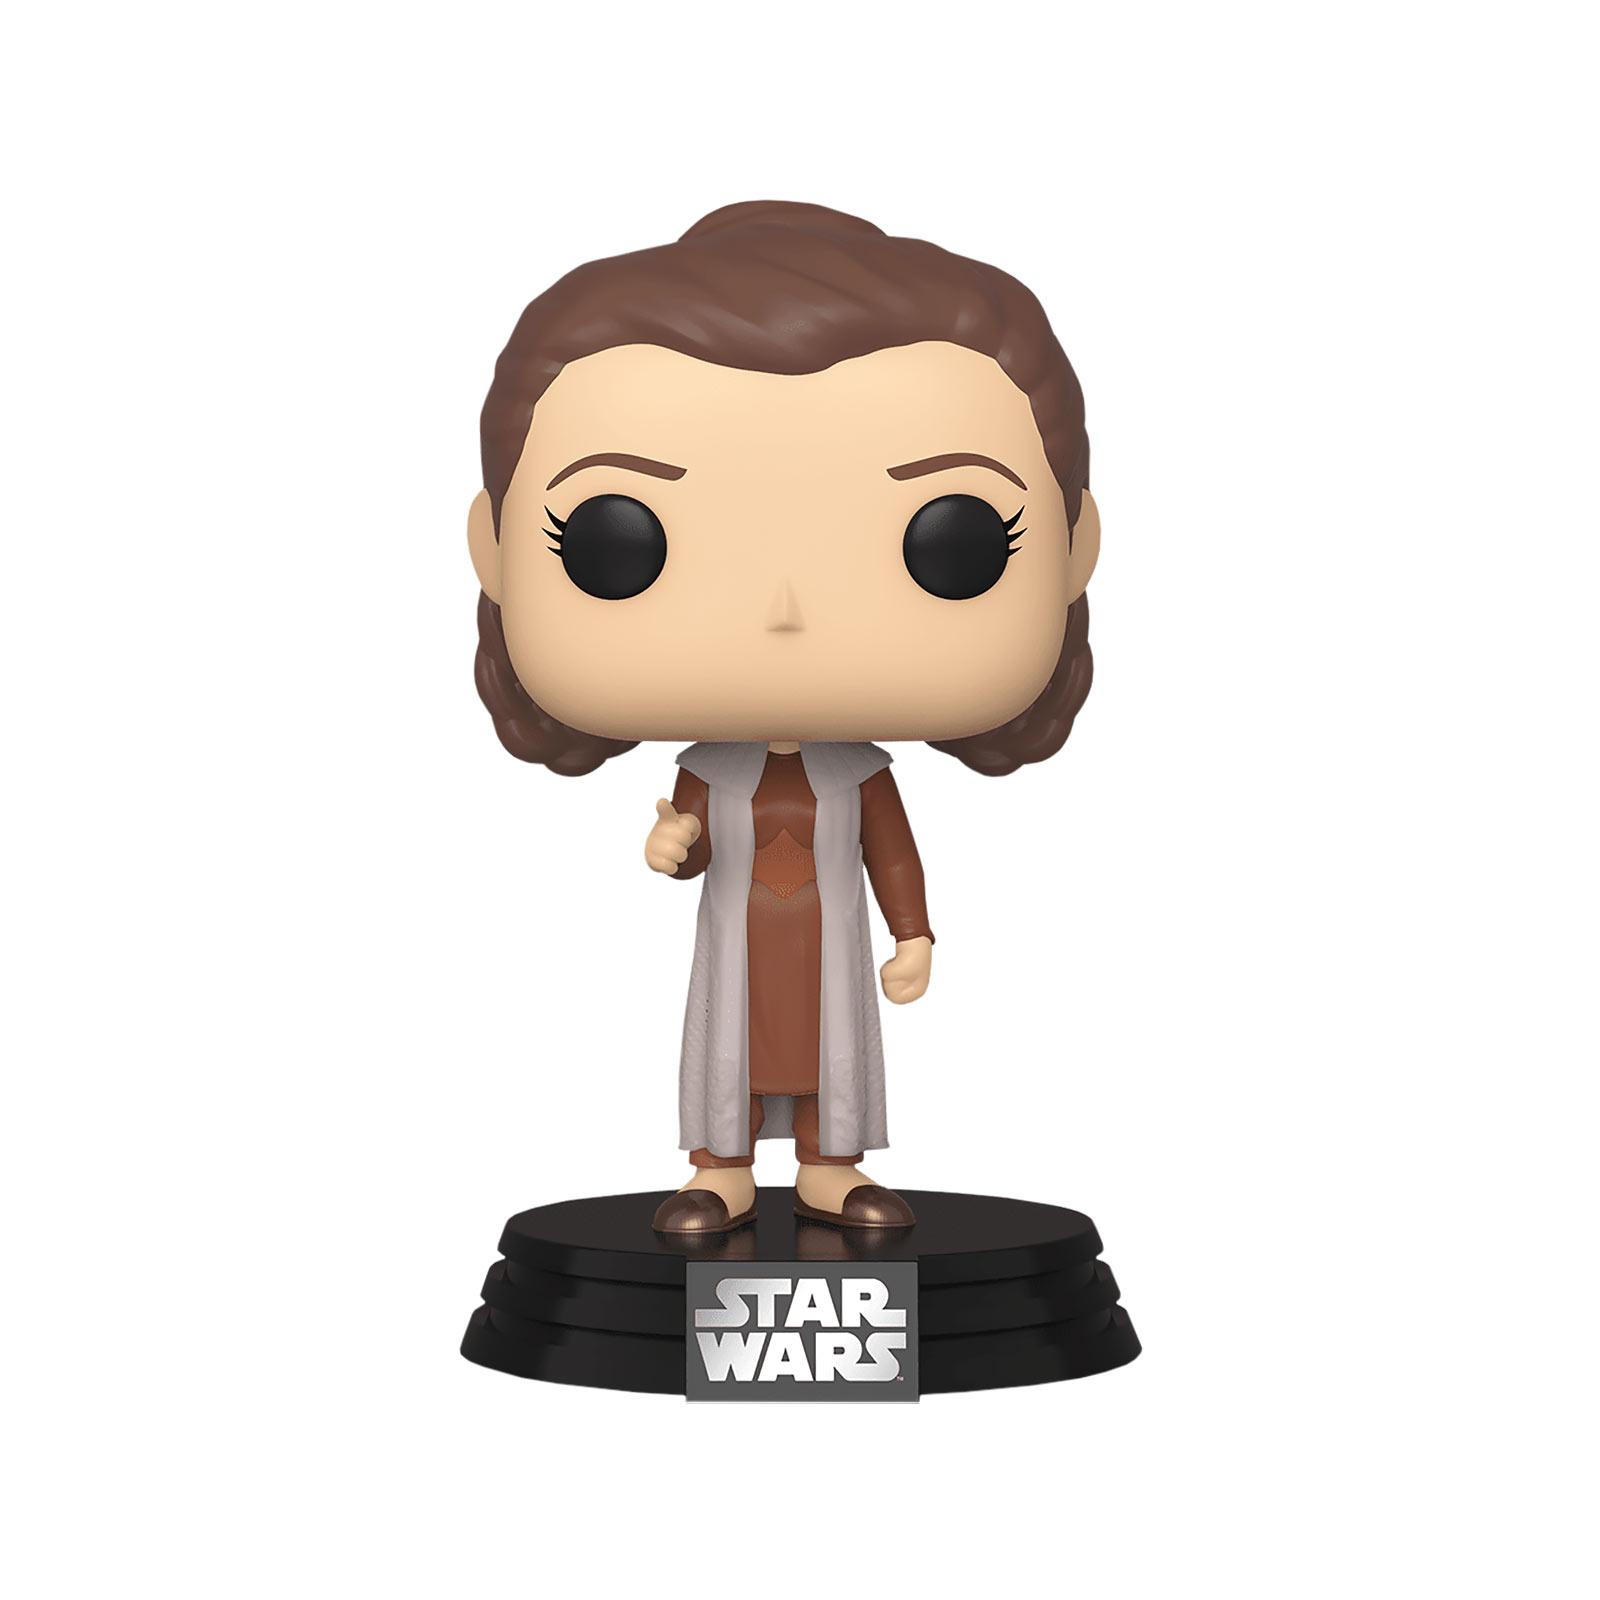 Star Wars - Leia Bespin Funko Pop Wackelkopf-Figur